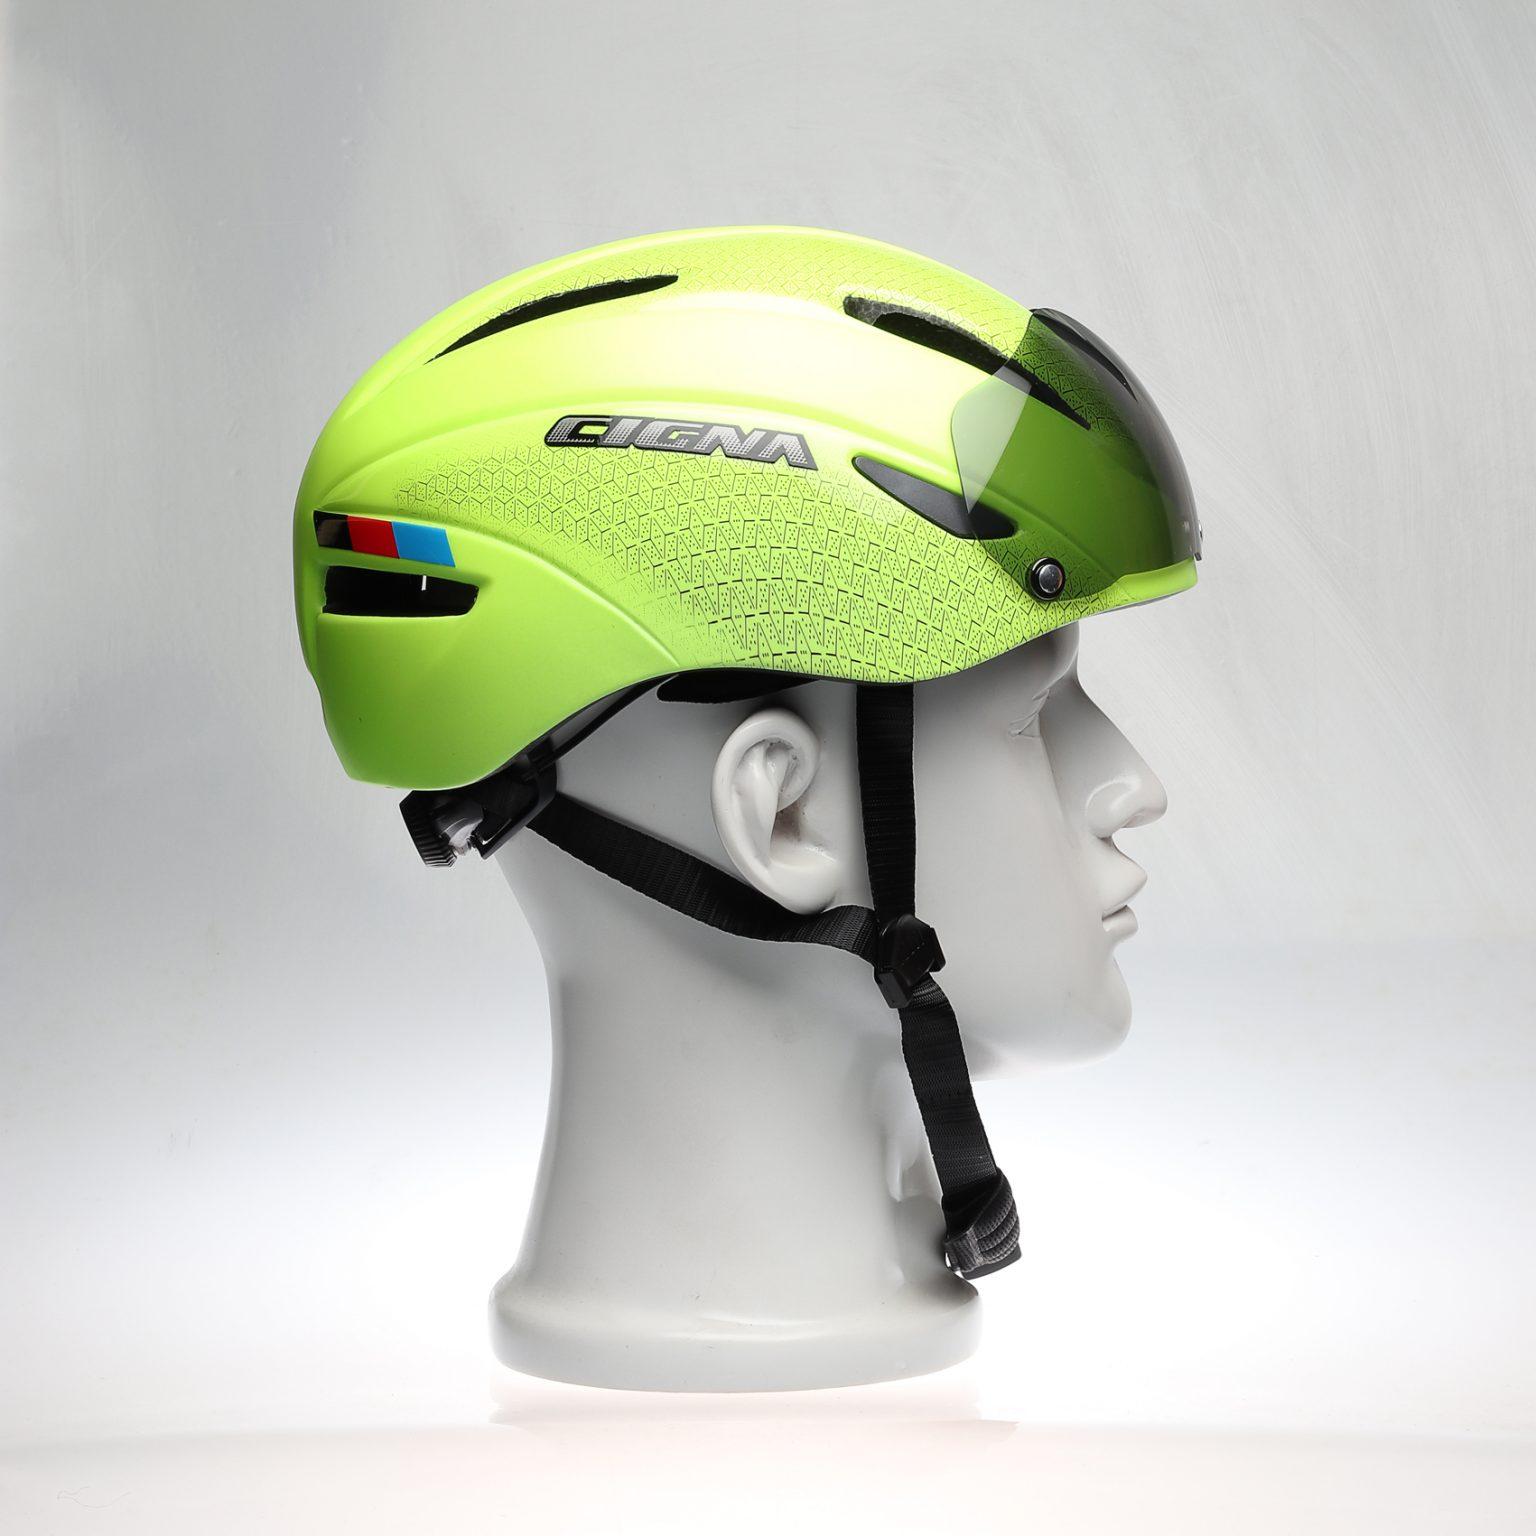 yellow helmet with visor